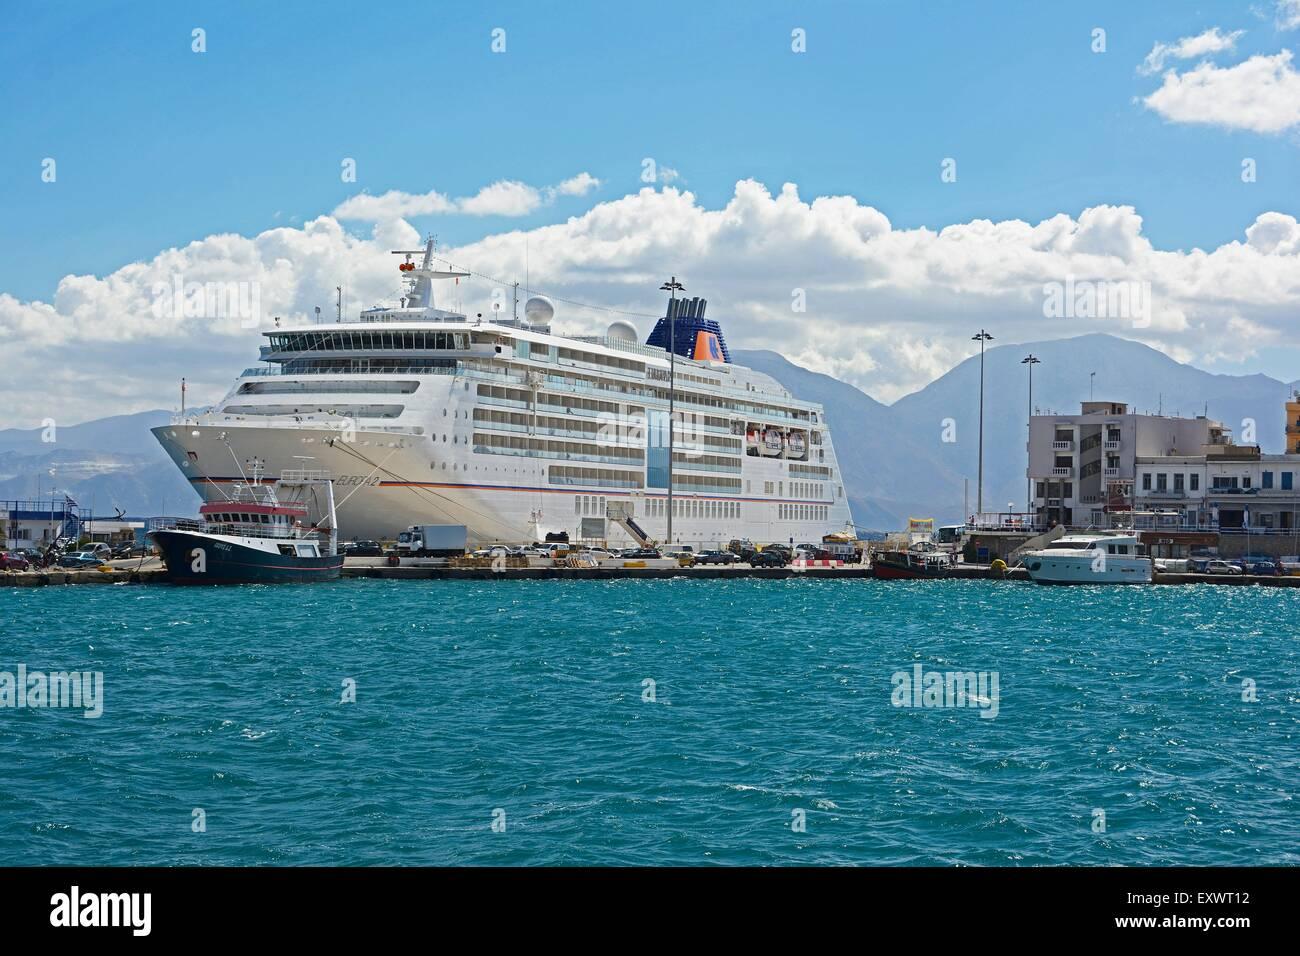 Cruise ship Europa 2 in harbour, Agios Nikolaos, Crete, Greece, Europe - Stock Image